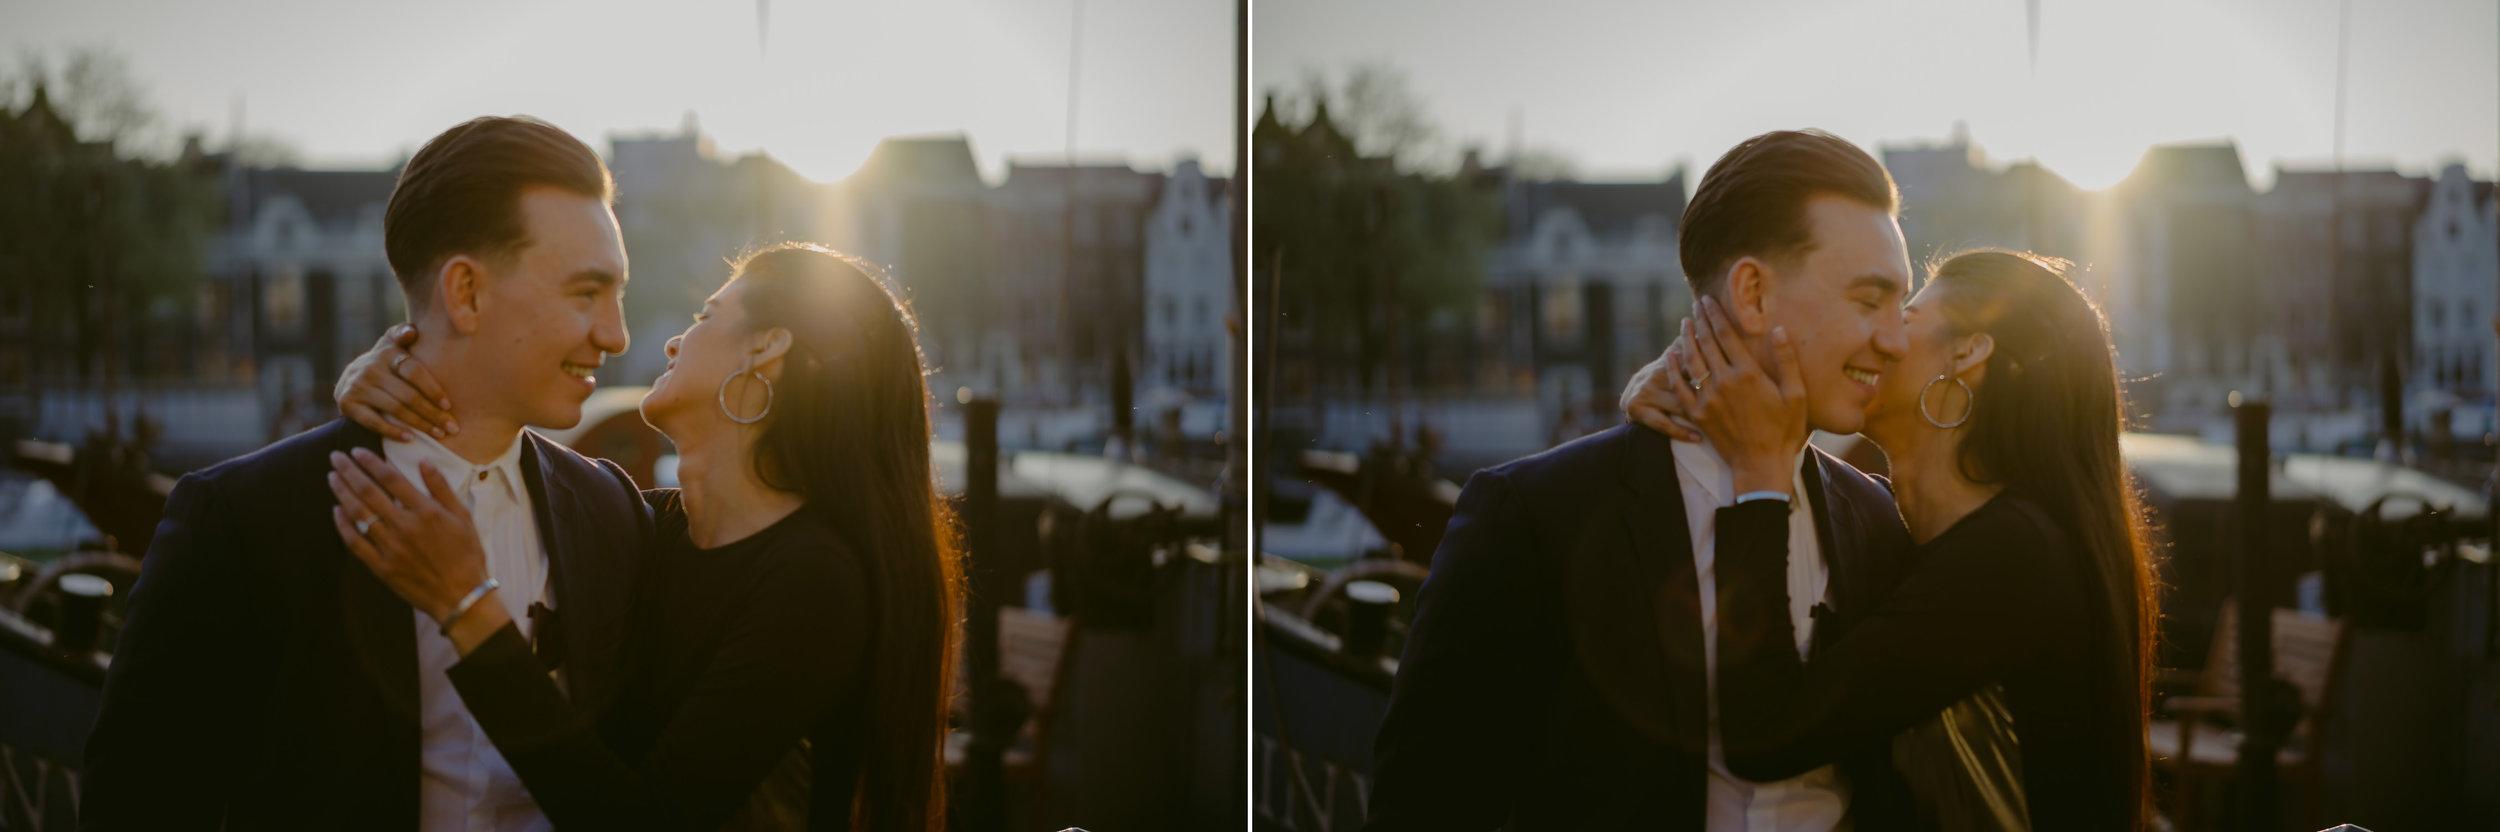 bruidsfotografie-amsterdam-utrecht-trouwfotograaf-mark-hadden-wedding-photography-ross - alexa-106 copy.jpg